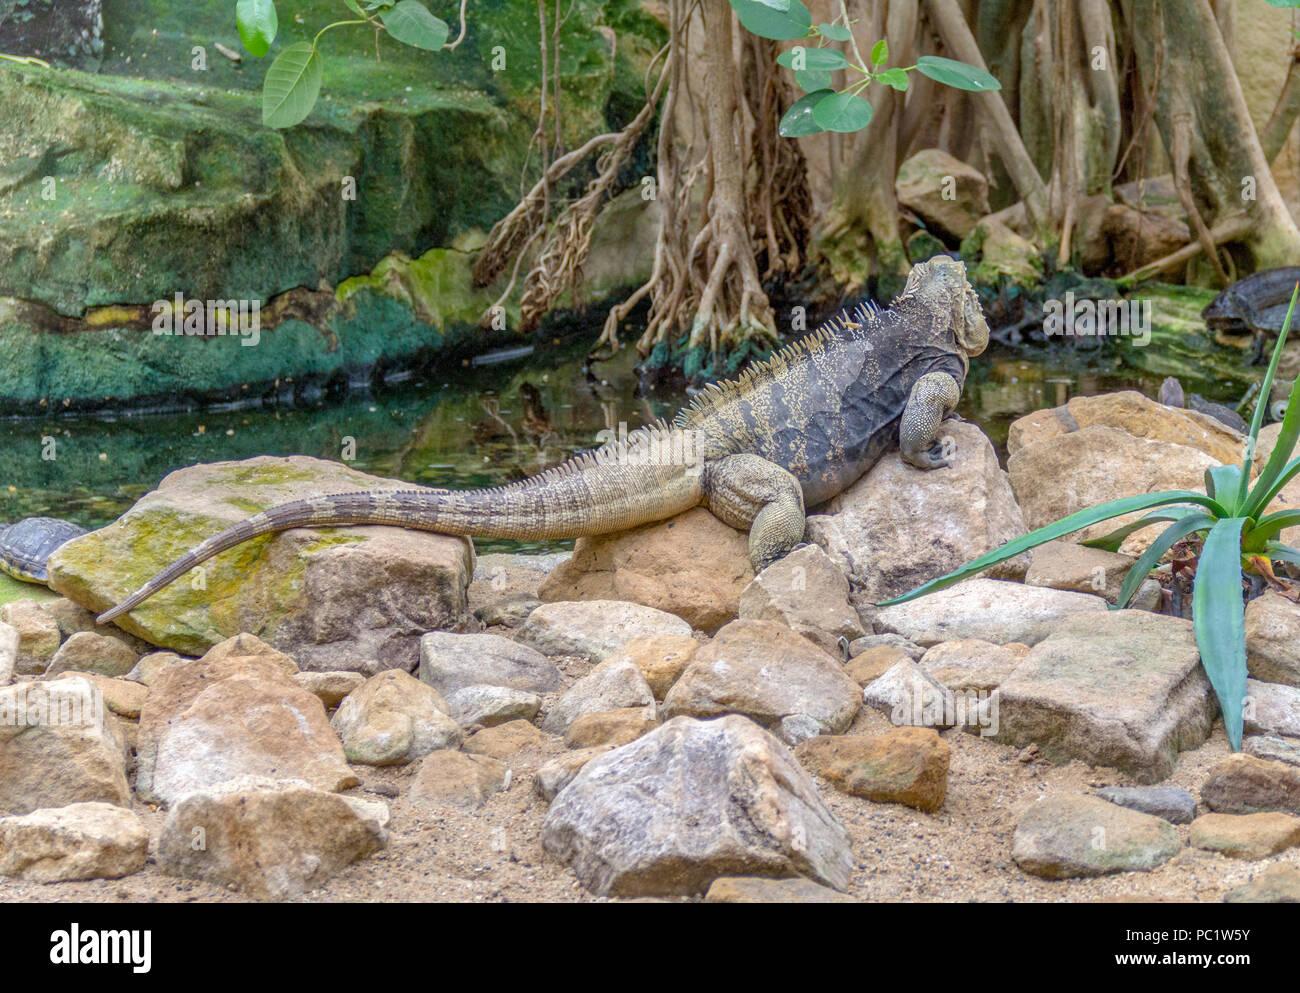 lizard named Cuban rock iguana on stony ground - Stock Image